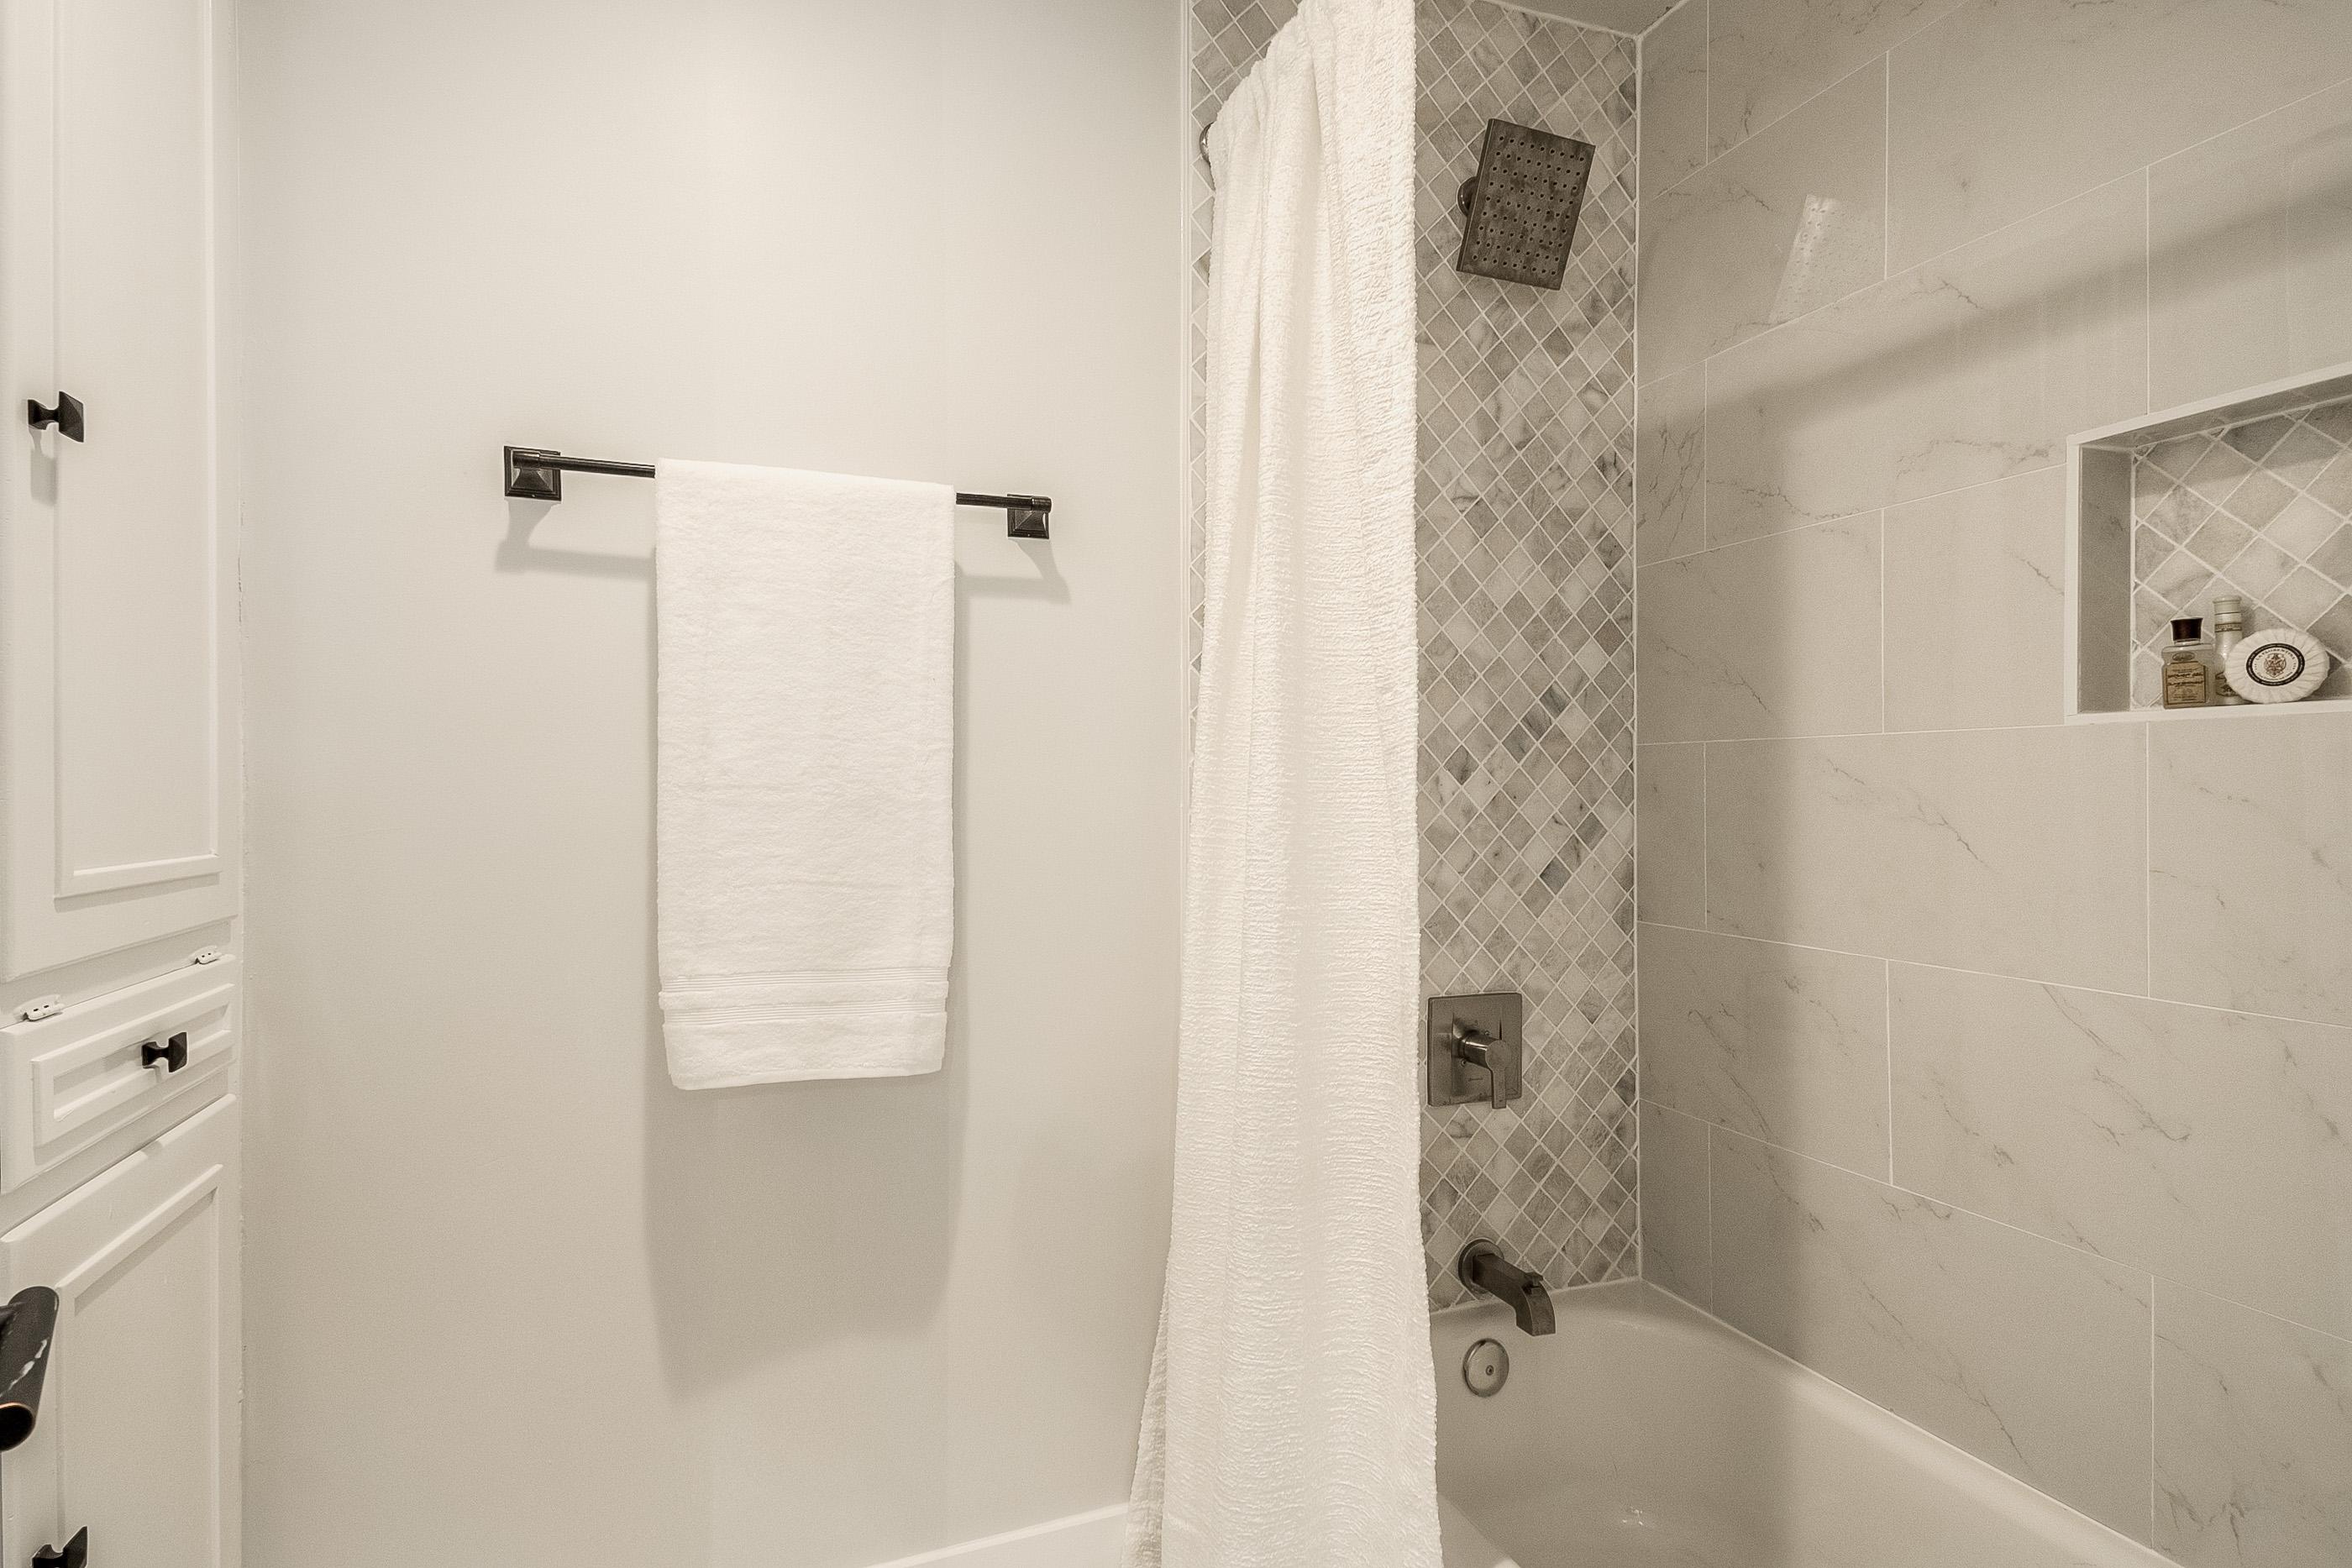 27 - jack and jill bath 2.jpg